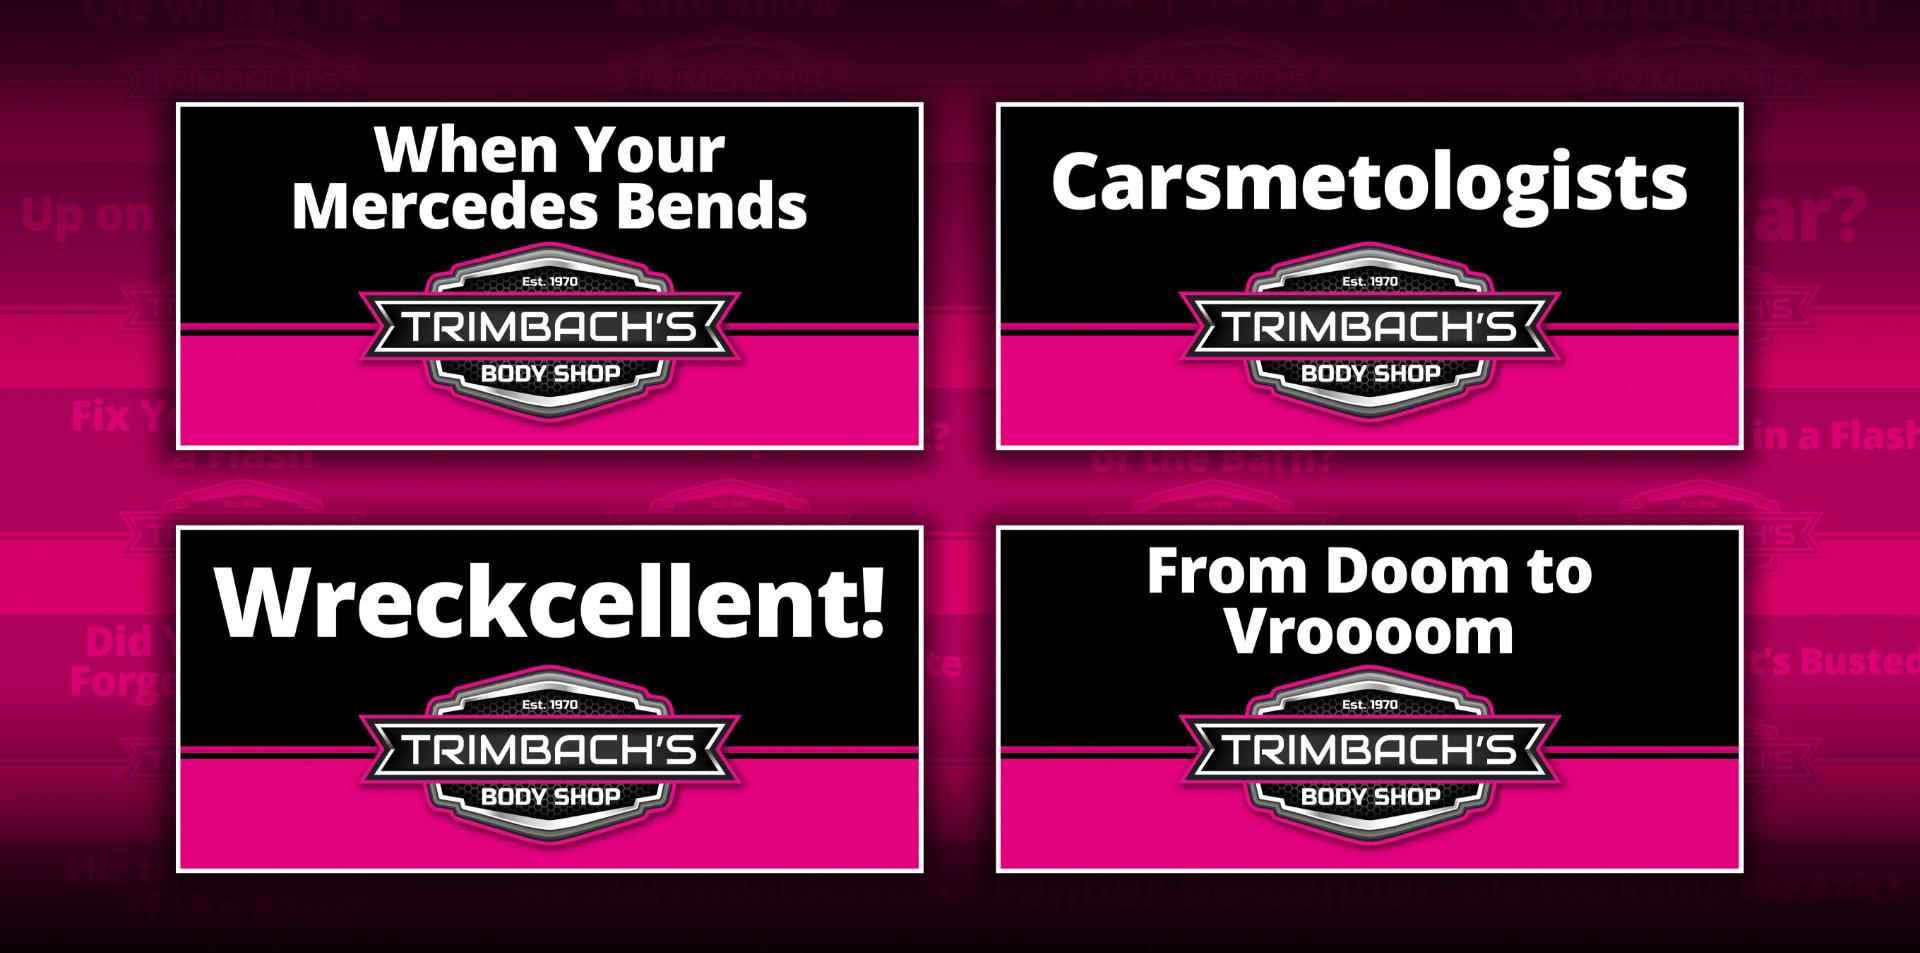 Four Trimbach's Body Shop billboards